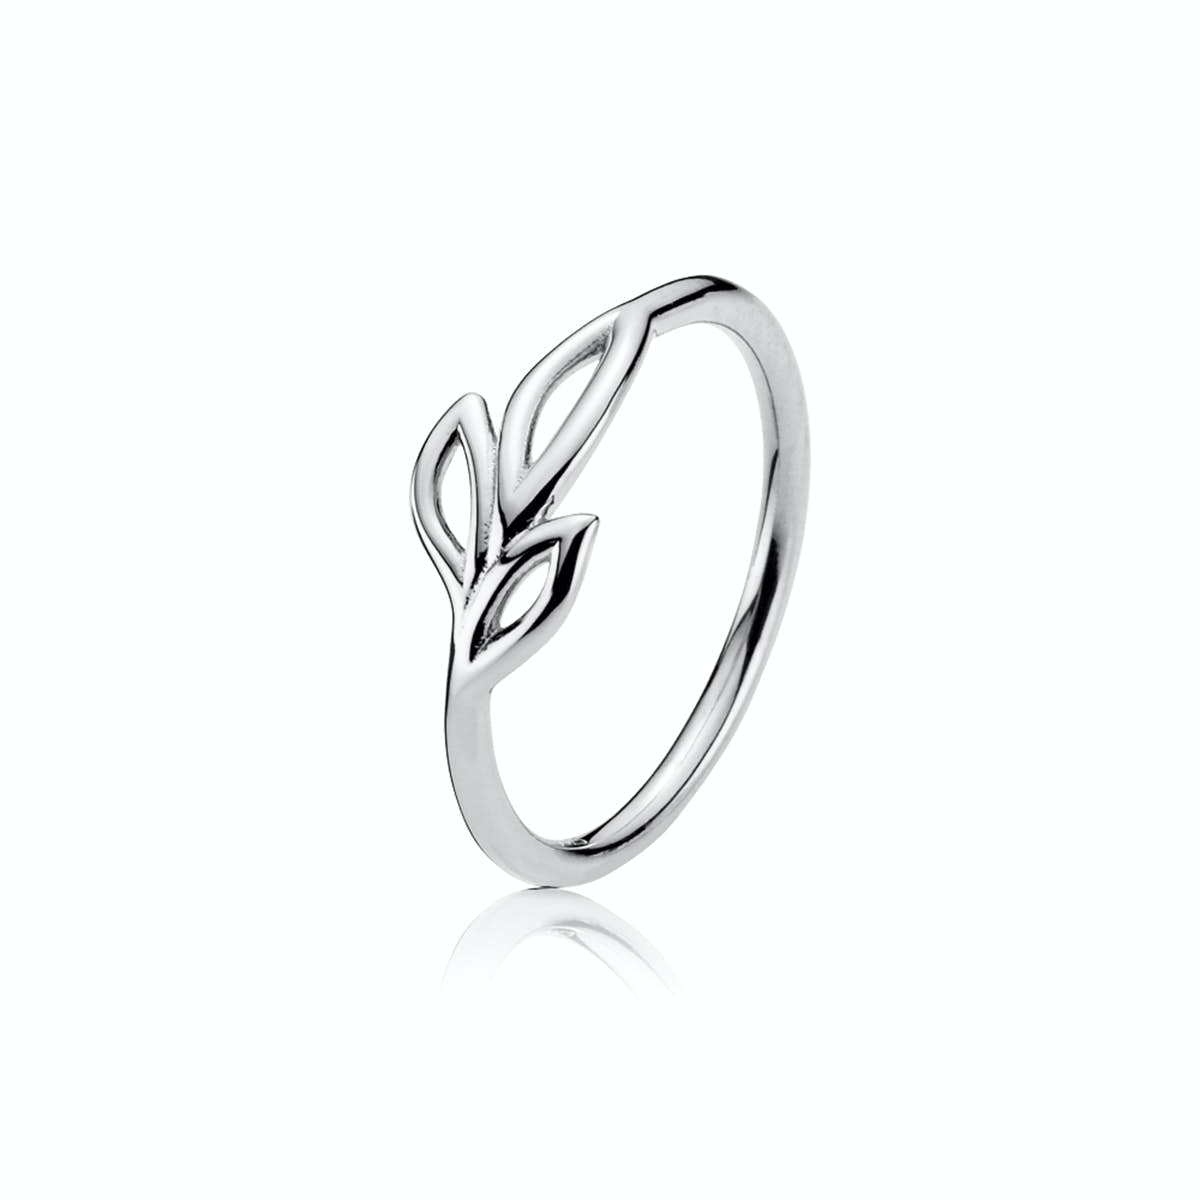 Dreamy Ring fra Izabel Camille i Sølv Sterling 925